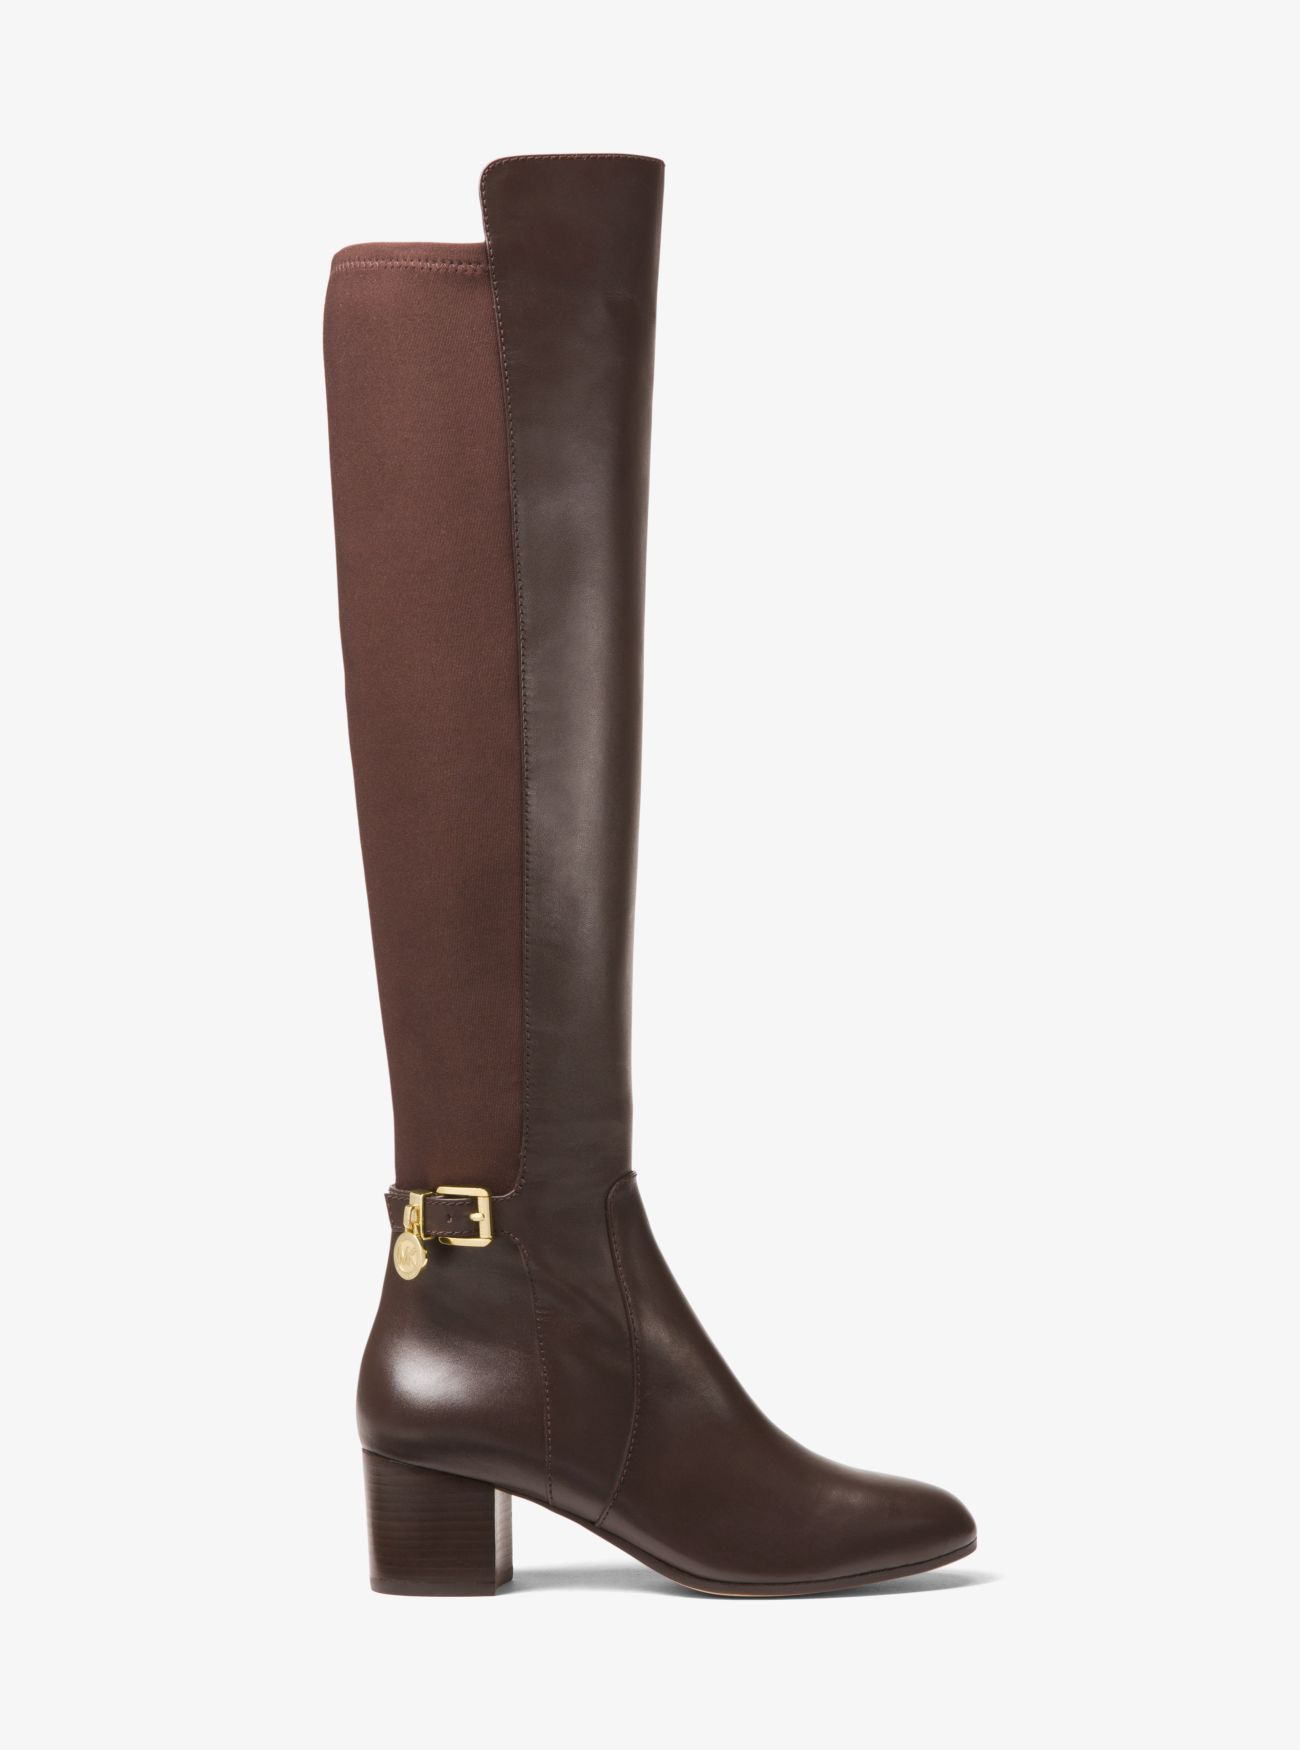 Aileen Leather Boot   Michael Kors